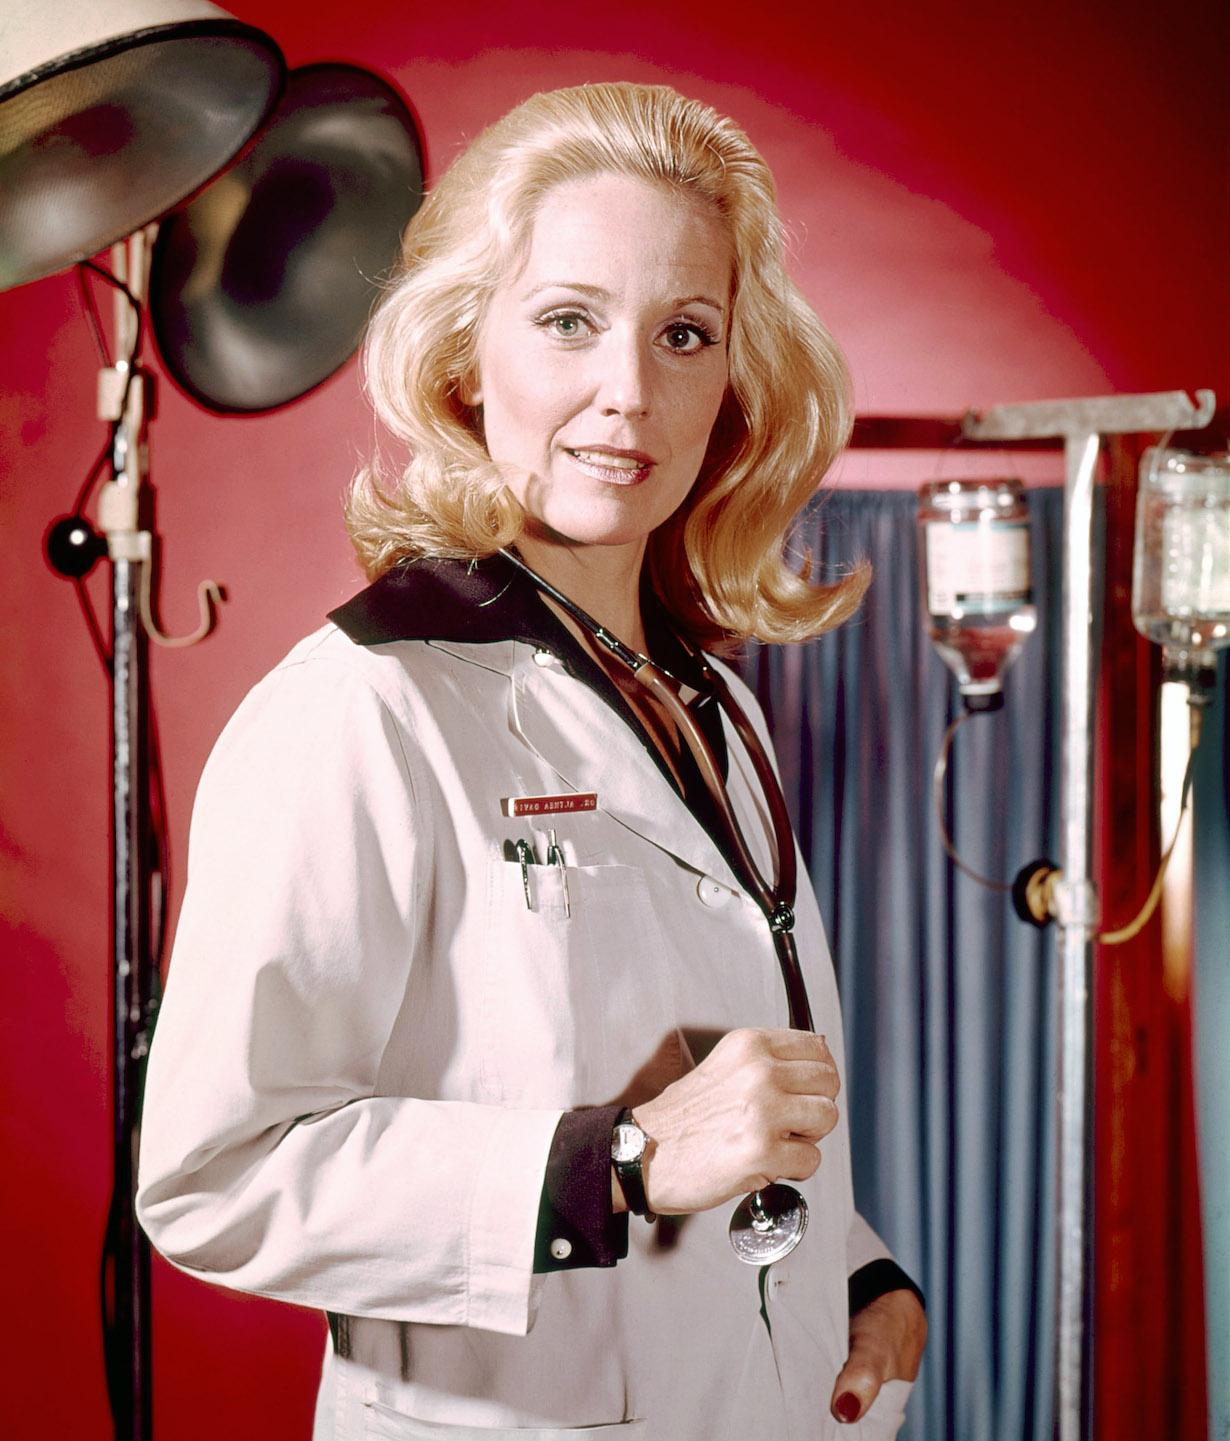 THE DOCTORS, Elizabeth Hubbard, 1963-82